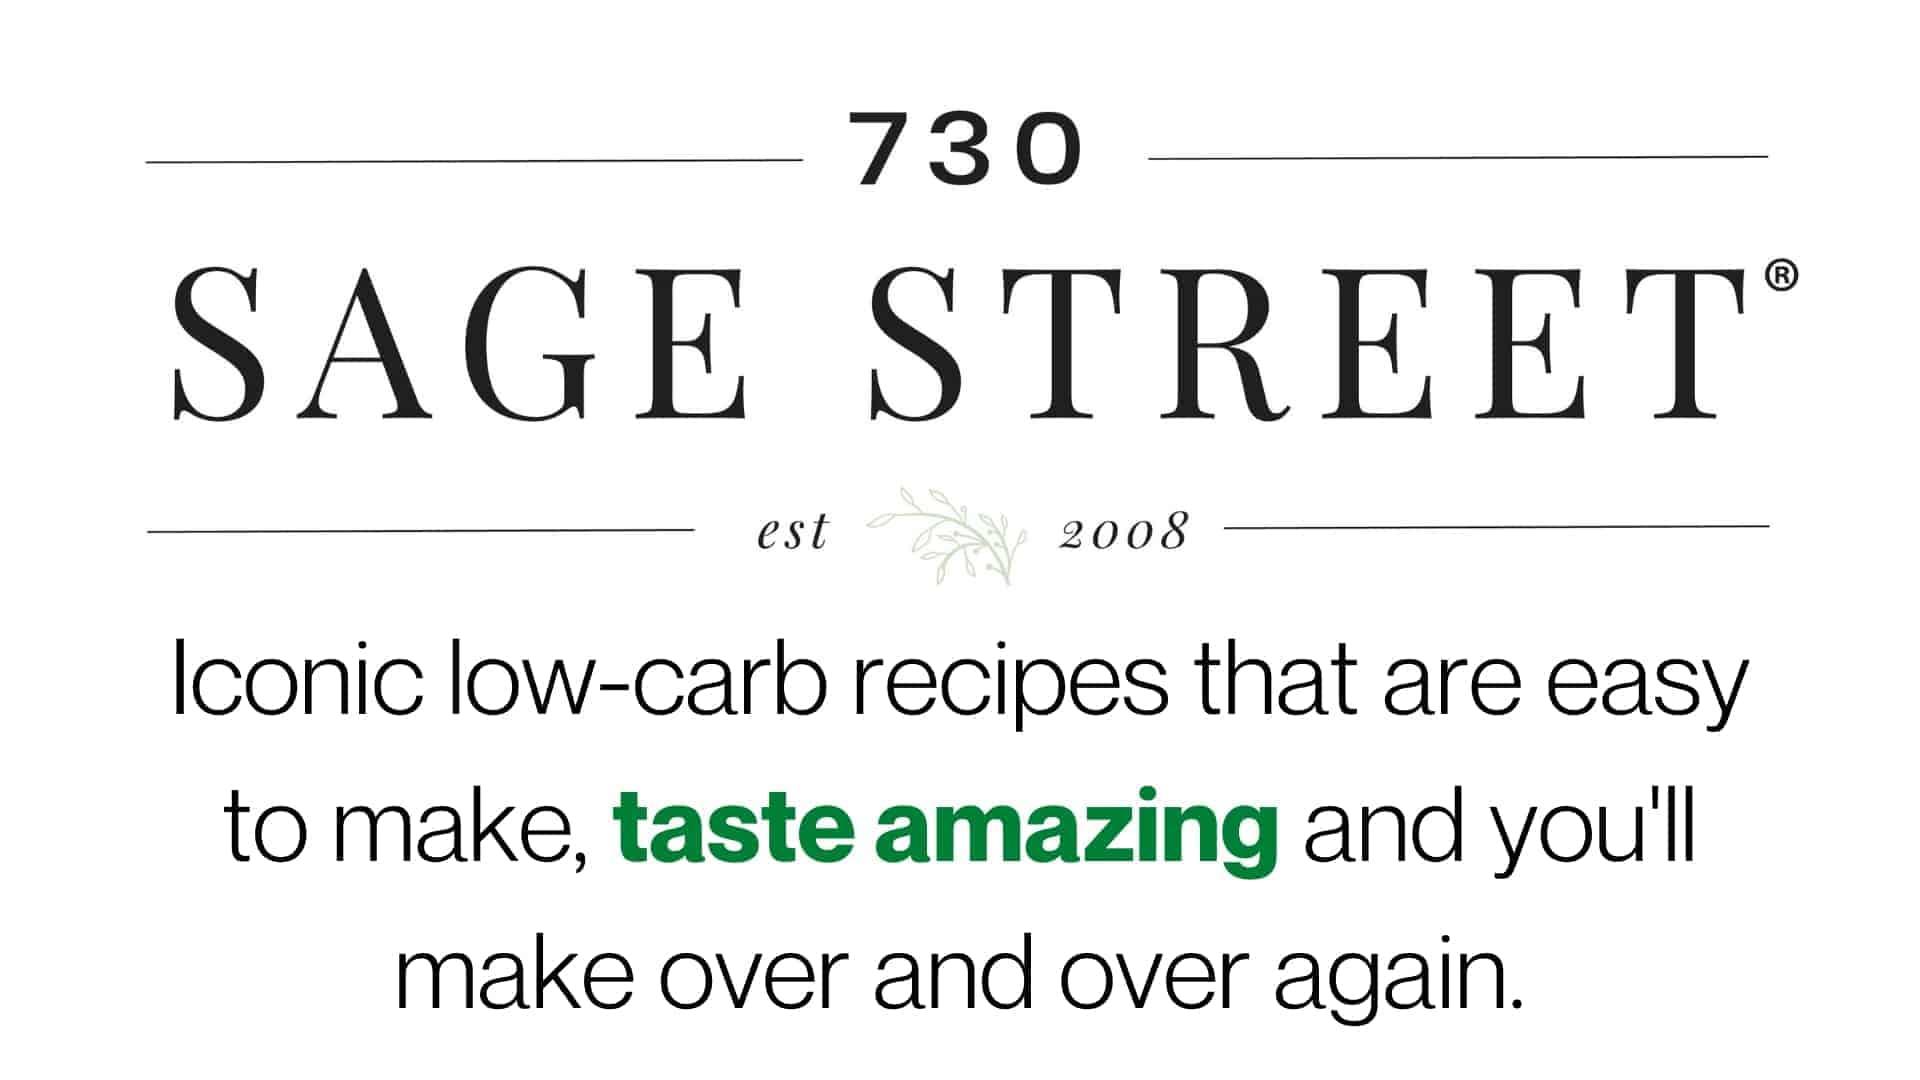 730 Sage Street - Iconic low-carb recipe ideas